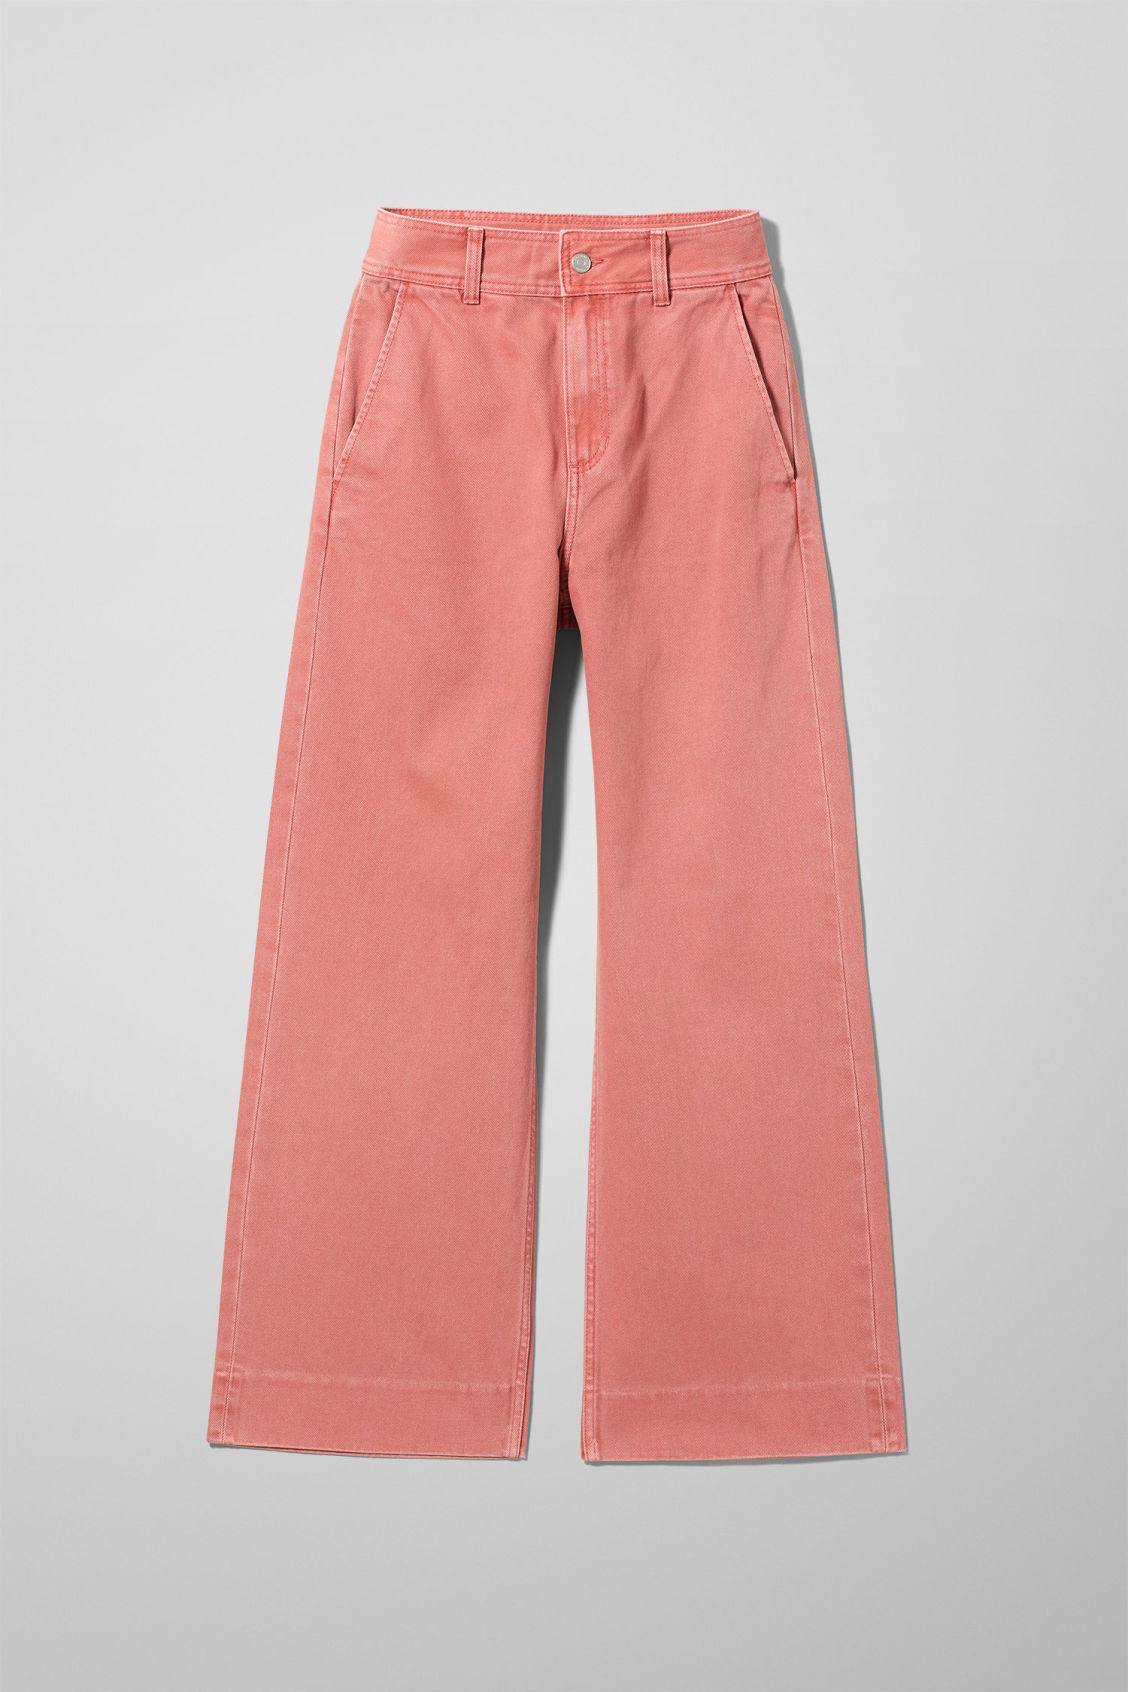 Cory Rose Denim Trousers - Orange-38